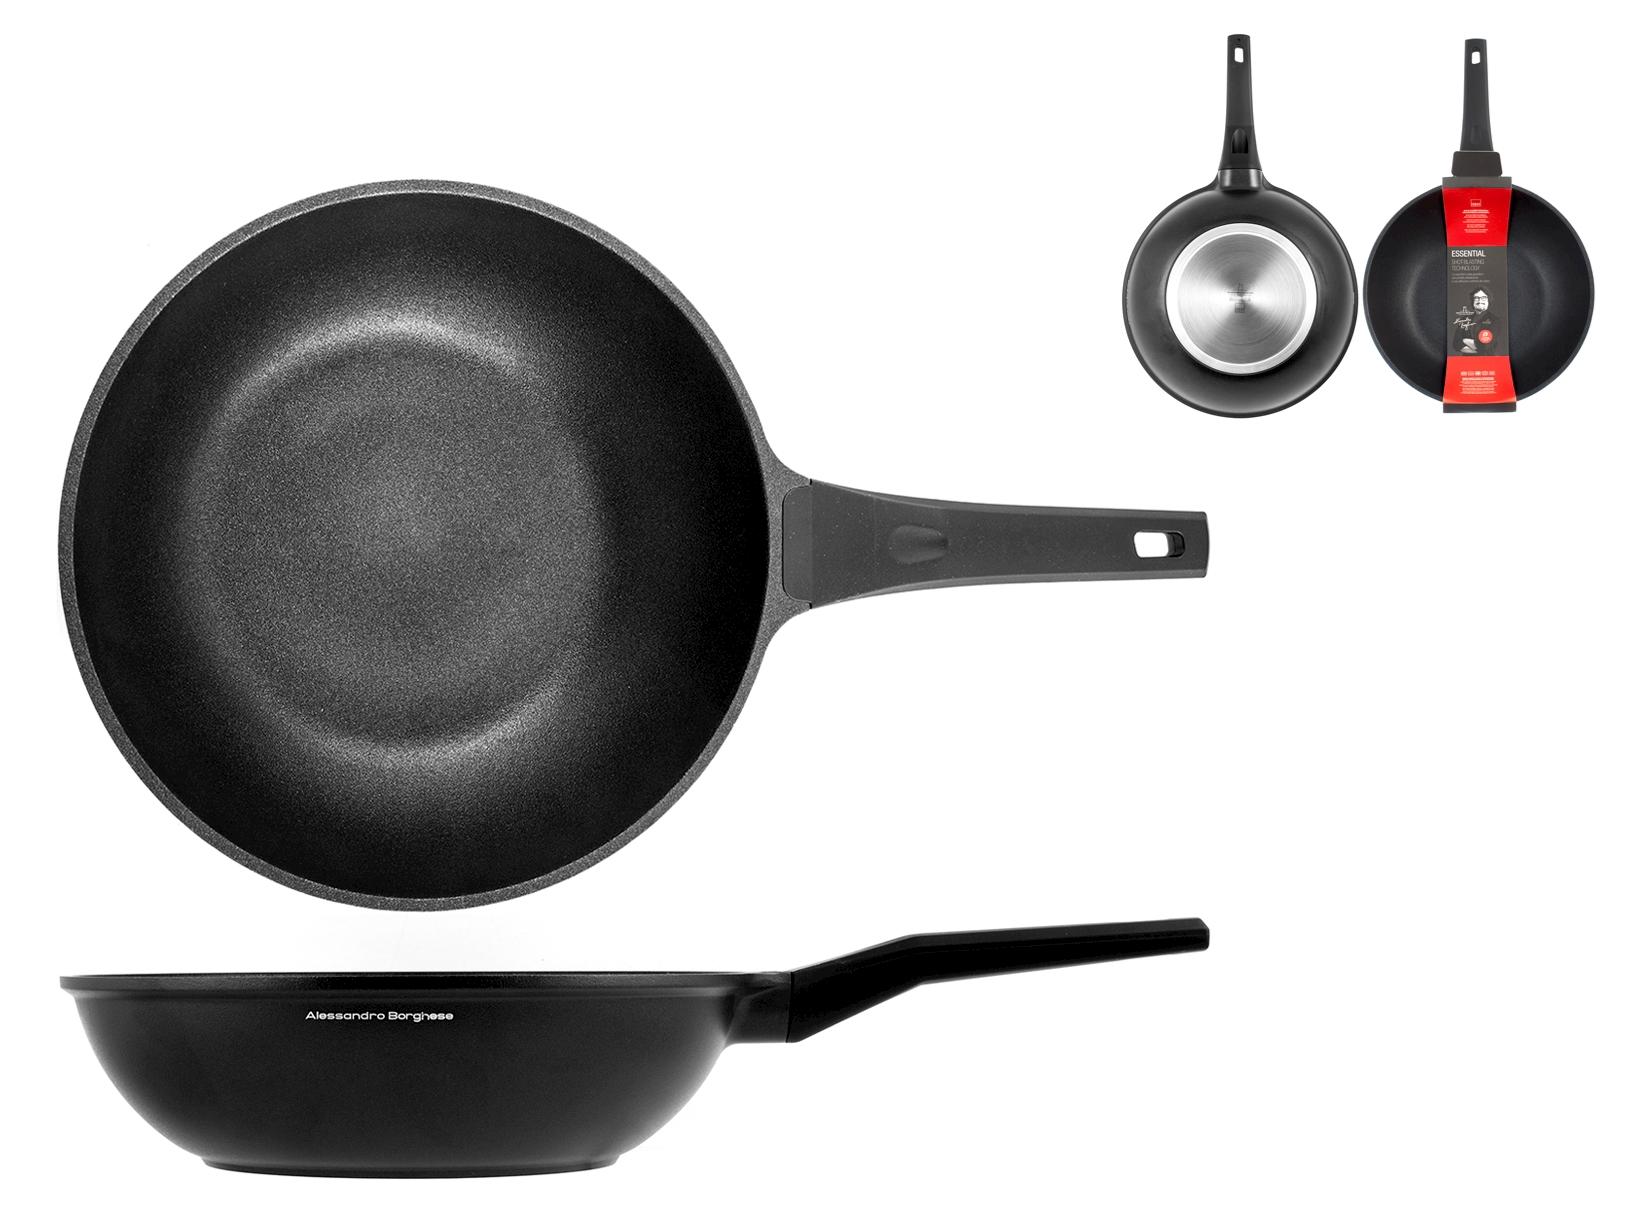 H&h Alessandro Borghese Essential Wok 1 Manico, Antiaderente